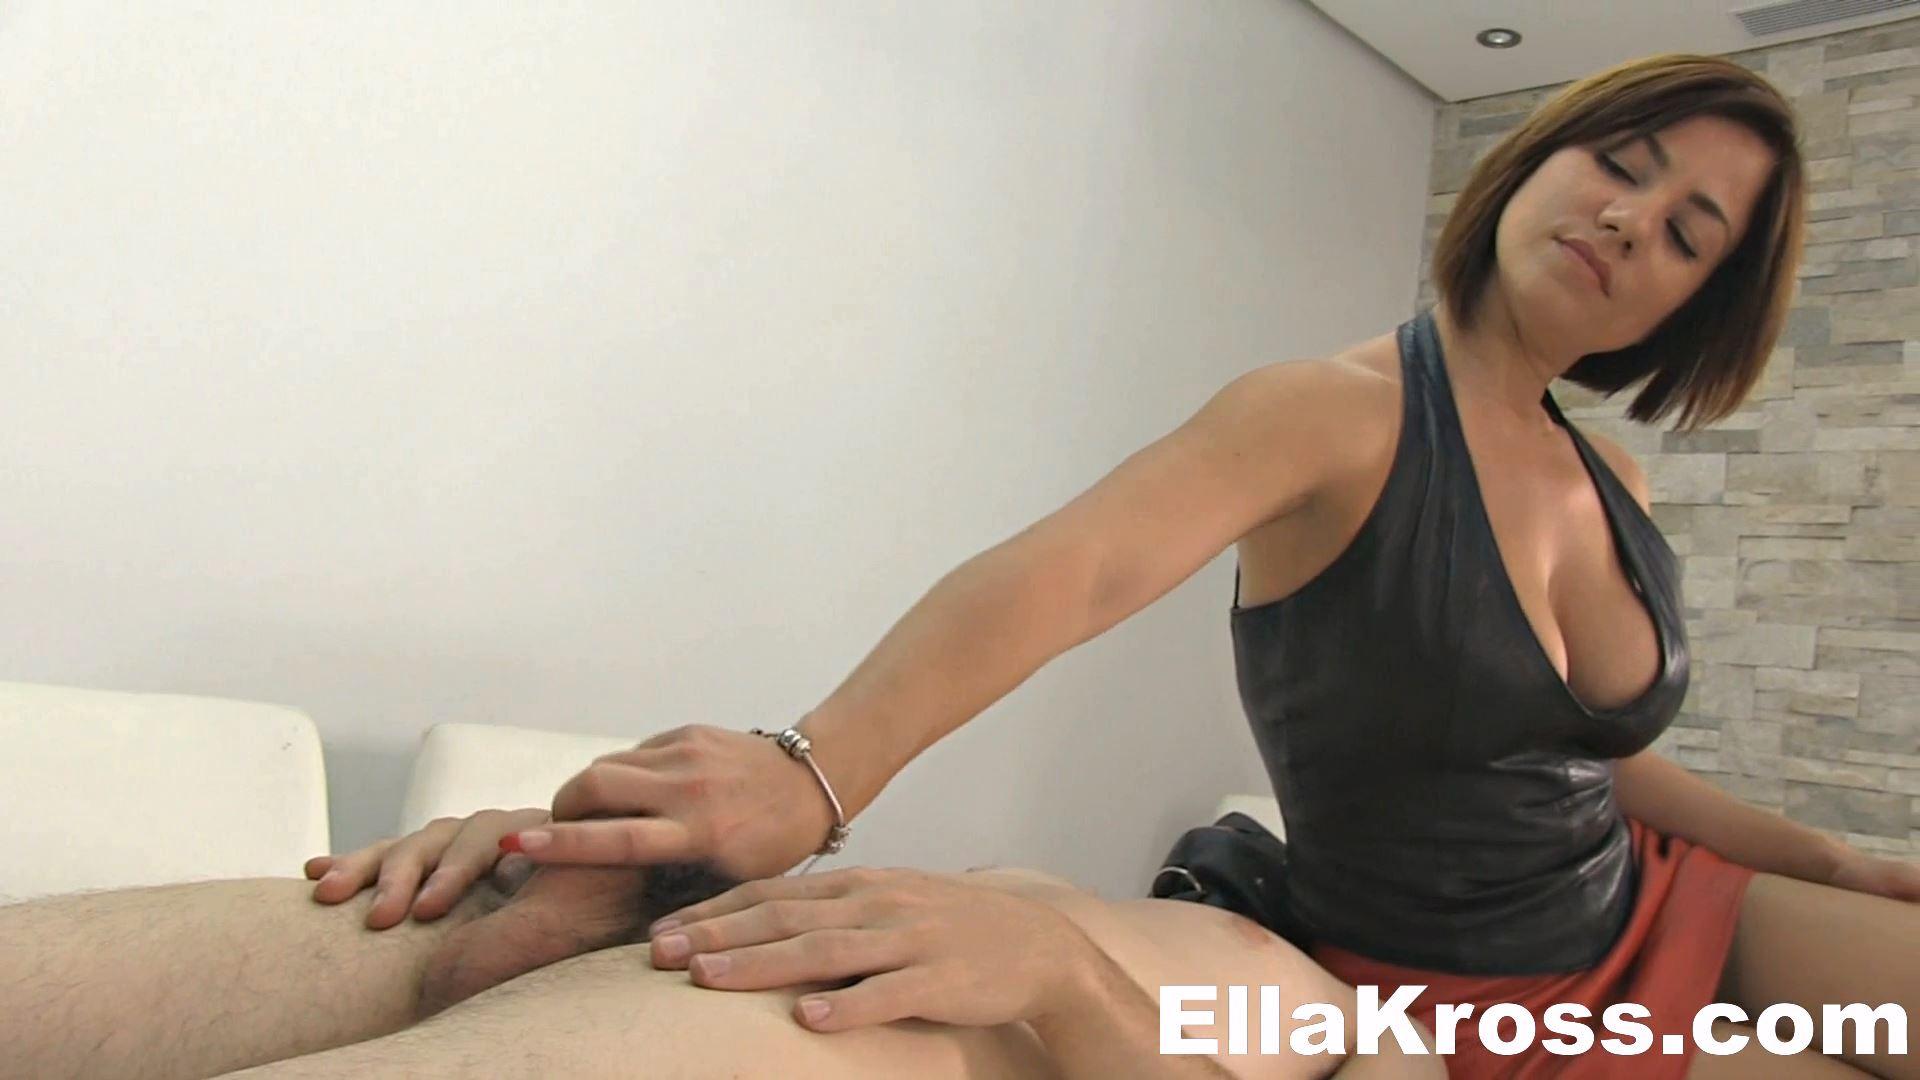 Ella Kross In Scene: Facesitting and Orasm Denial - ELLAKROSS - FULL HD/1080p/MP4